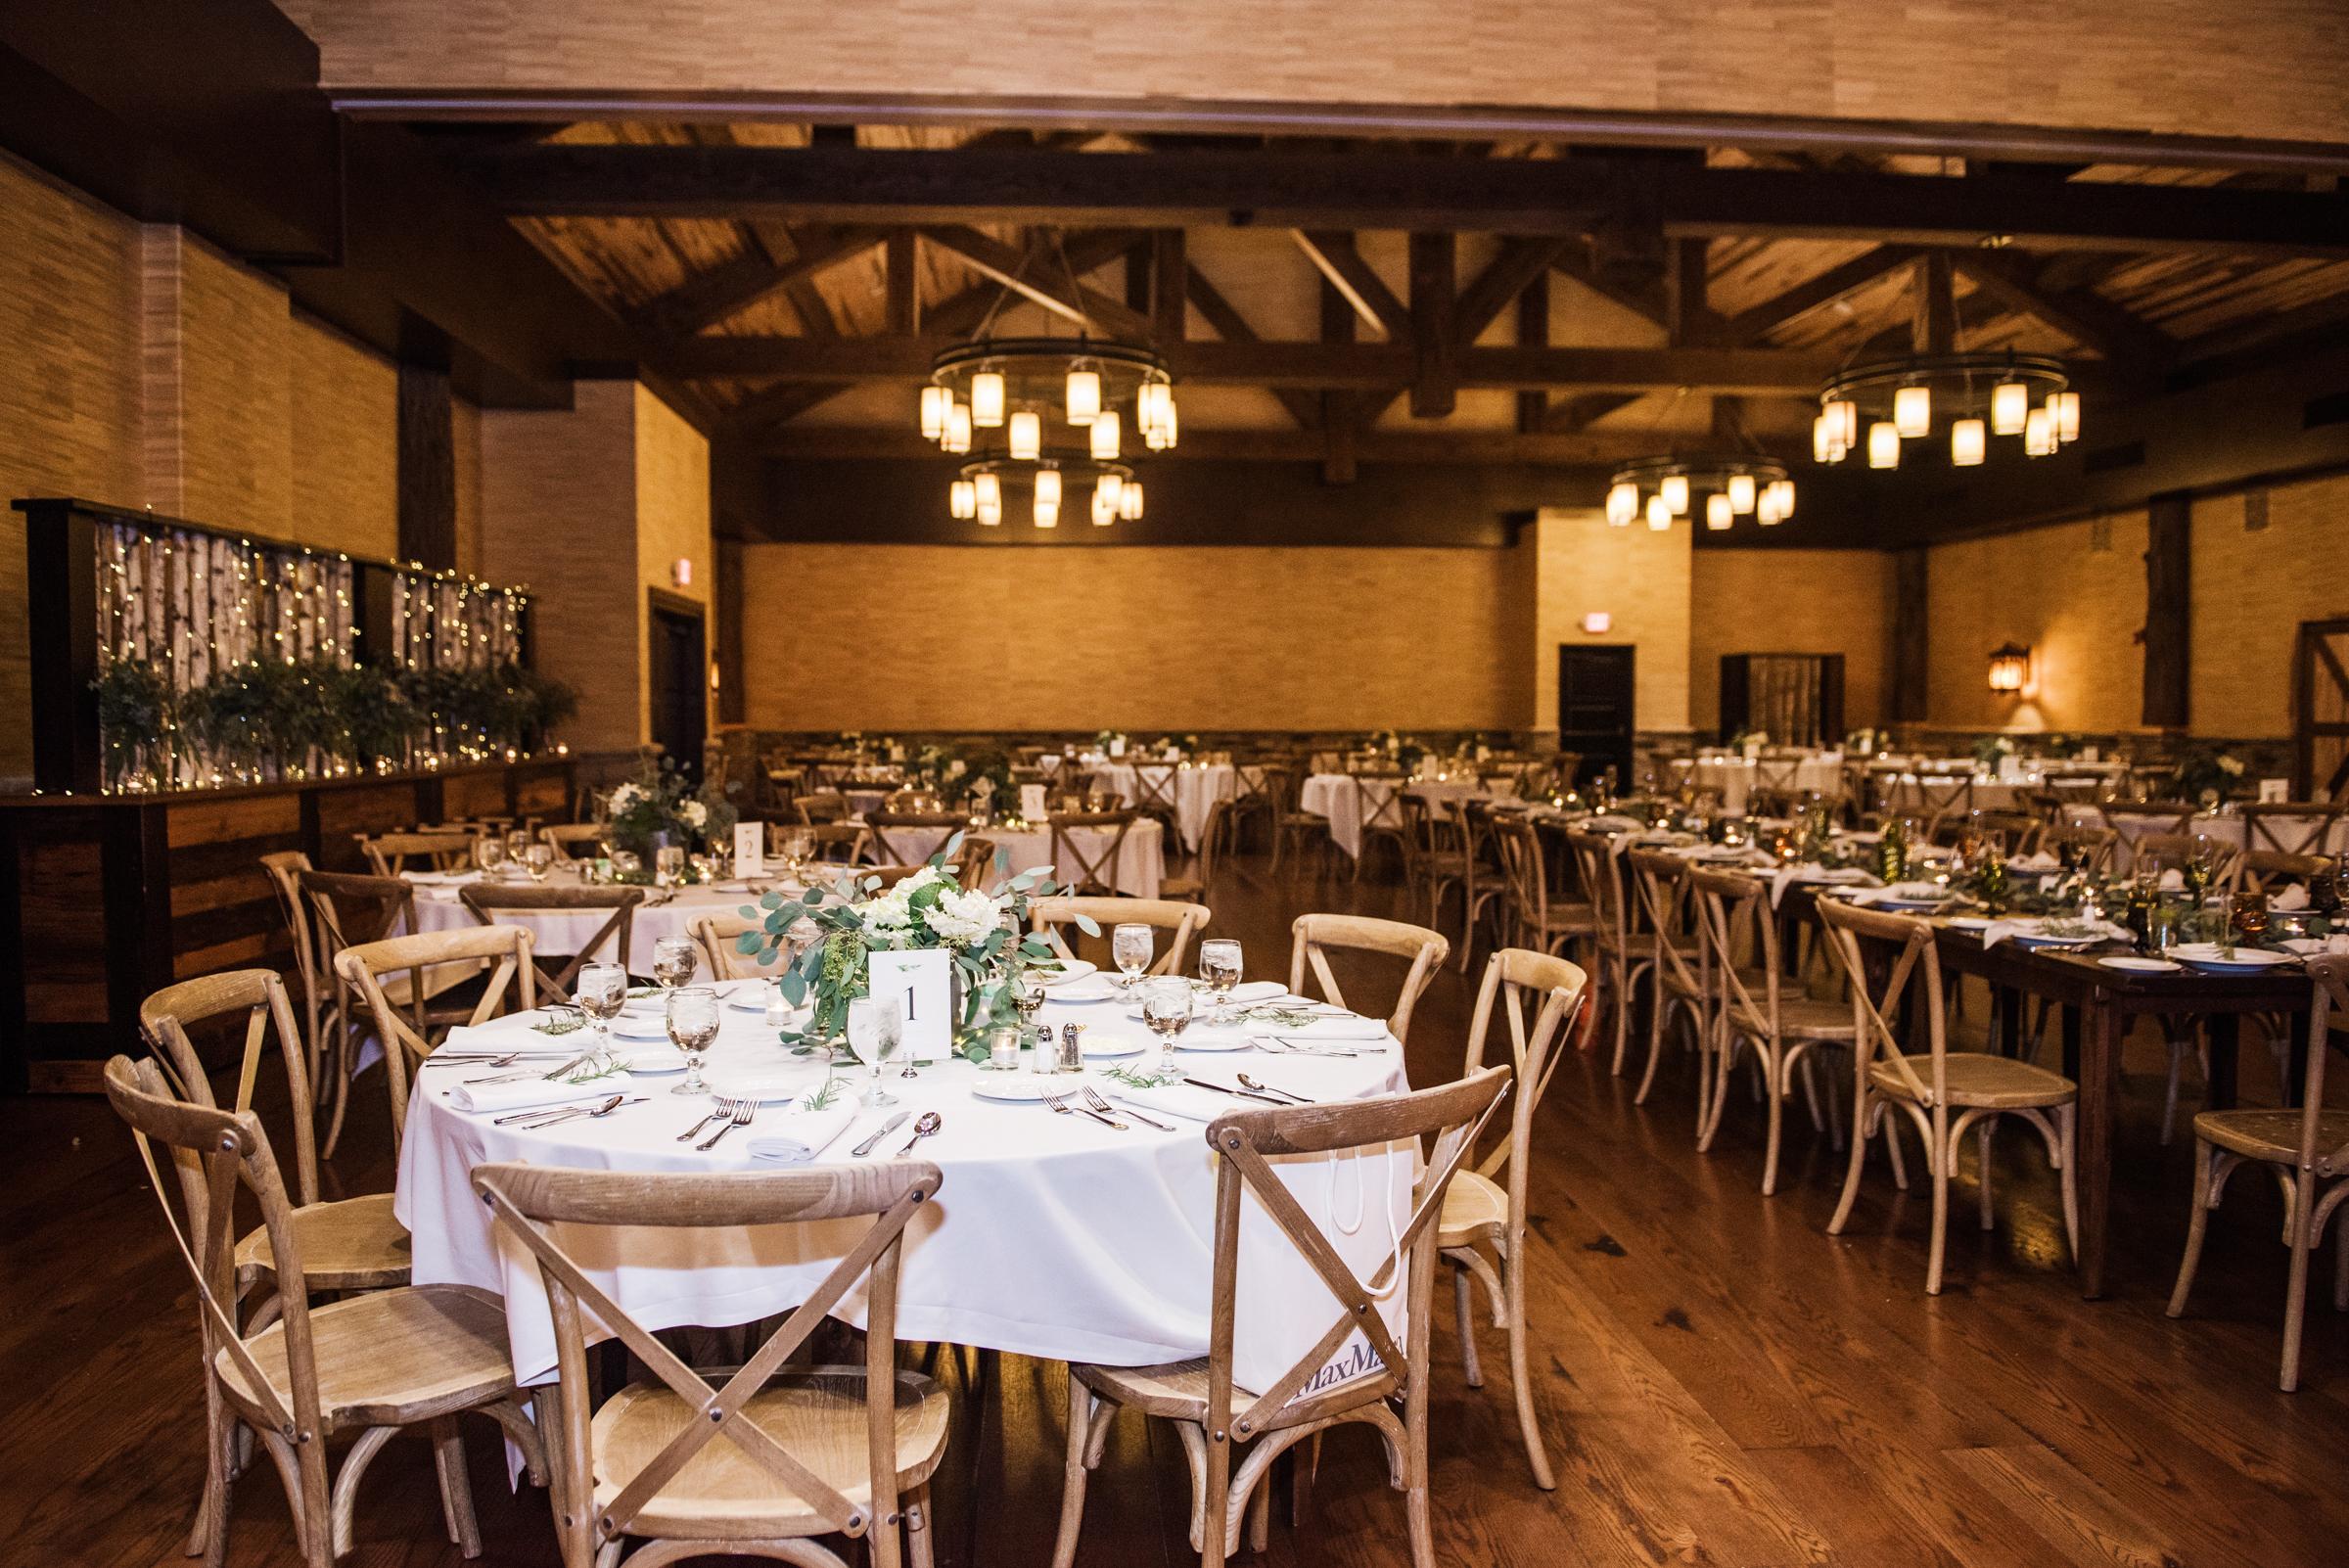 Tailwater_Lodge_Central_NY_Wedding_JILL_STUDIO_Rochester_NY_Photographer_DSC_7619.jpg